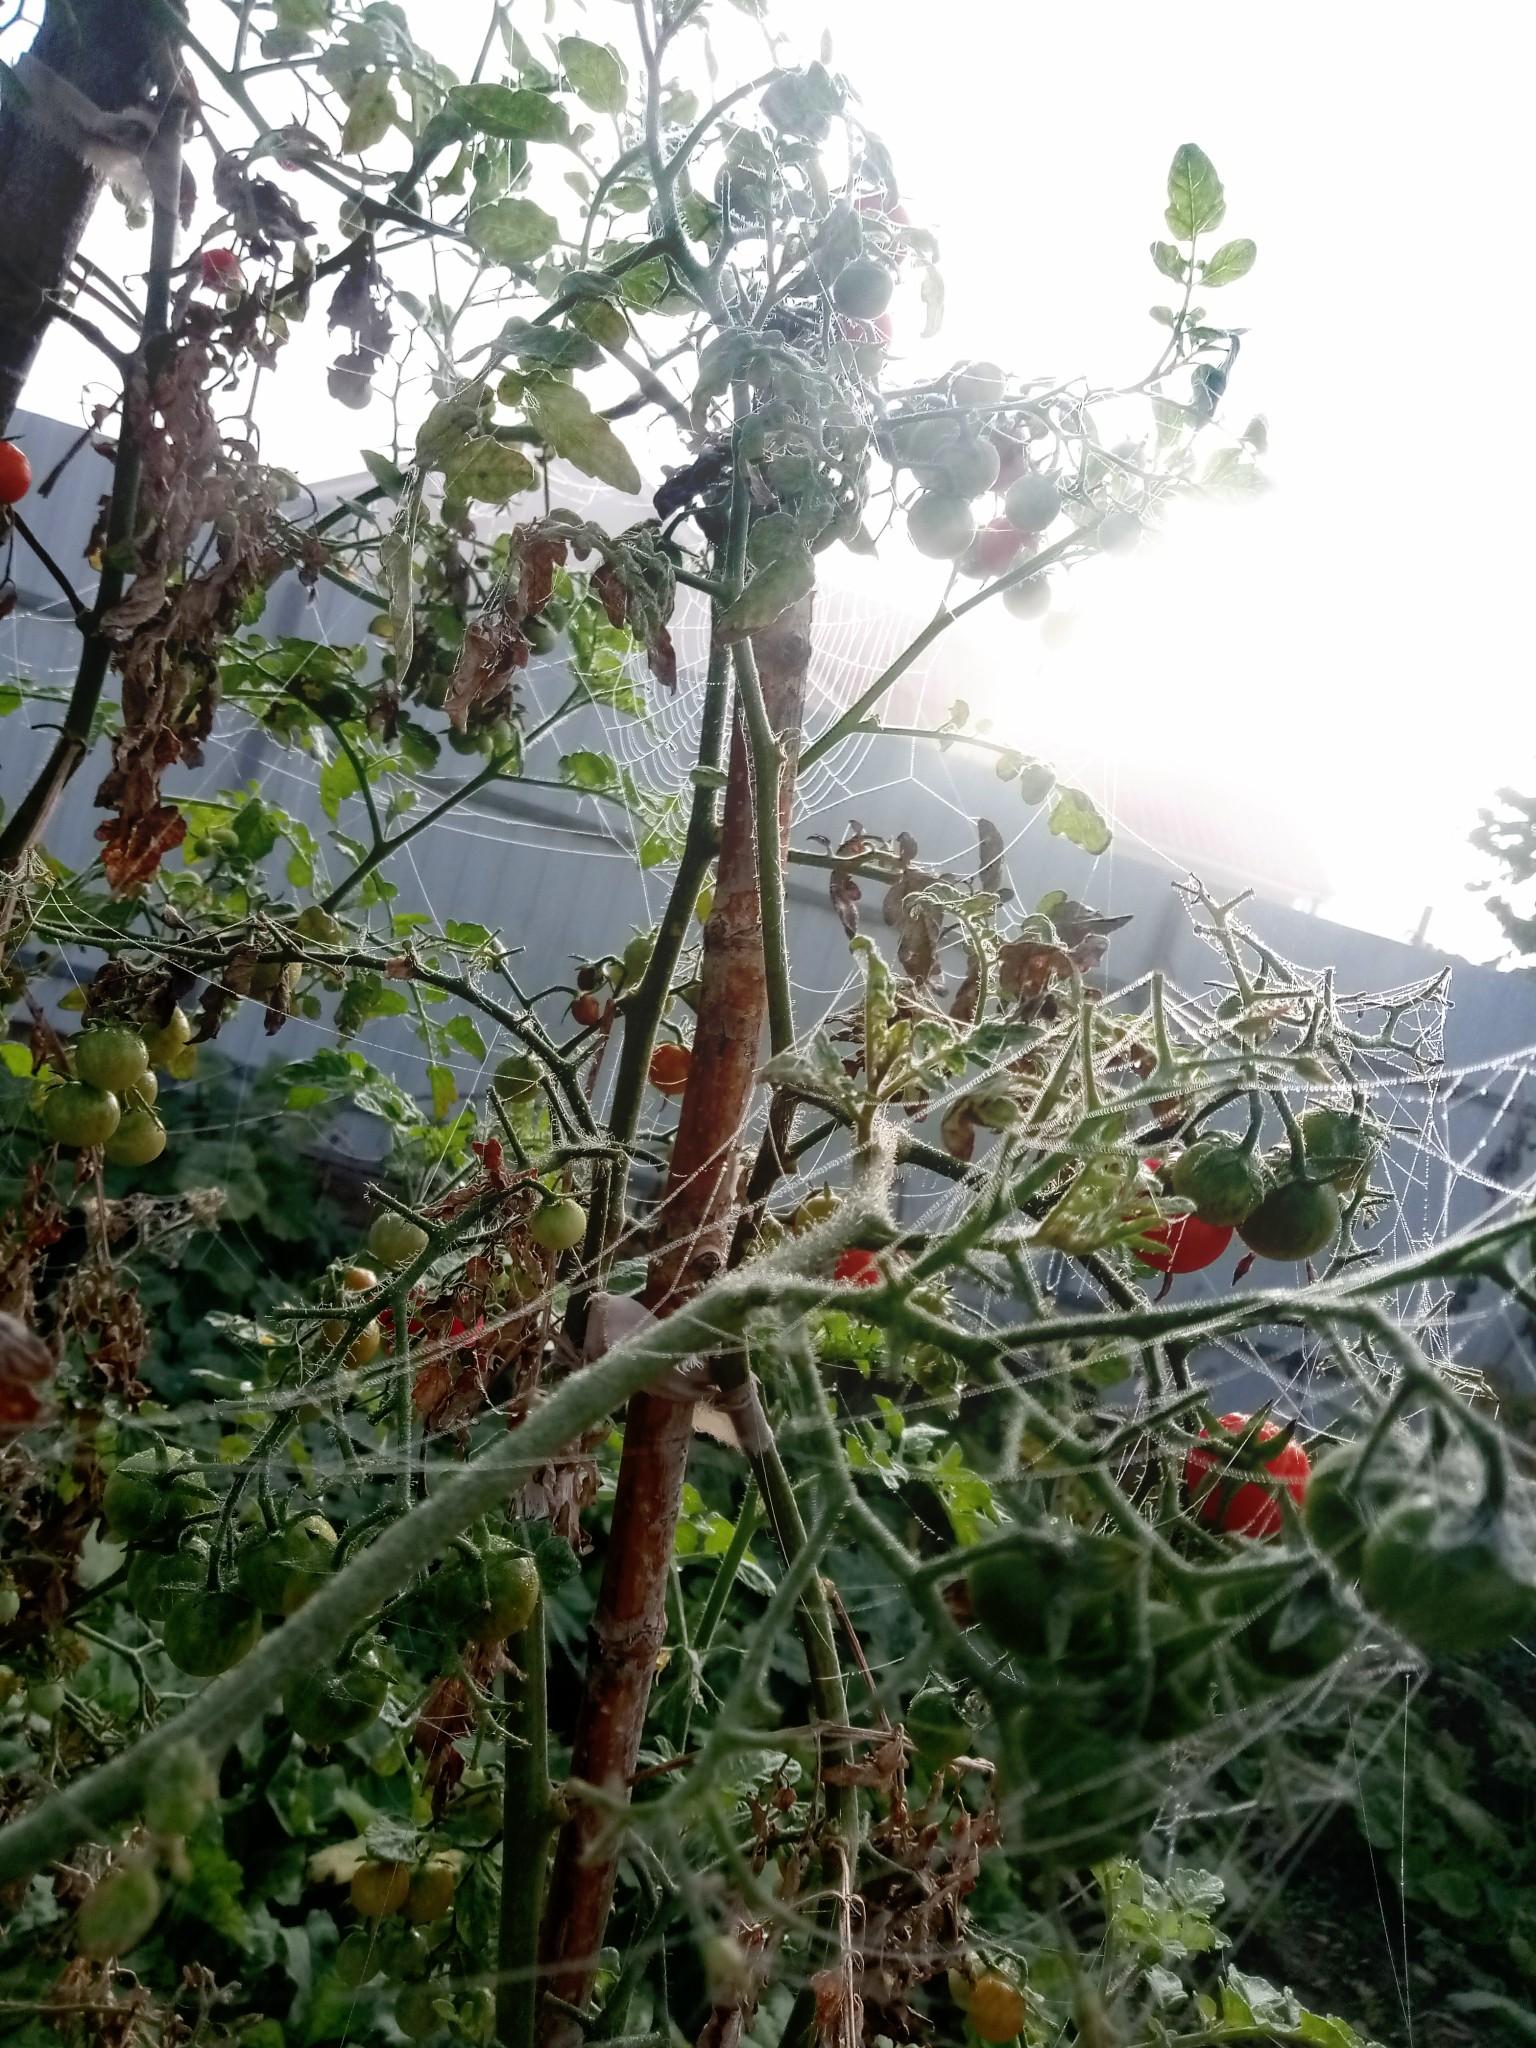 Spider web in fog photo 9